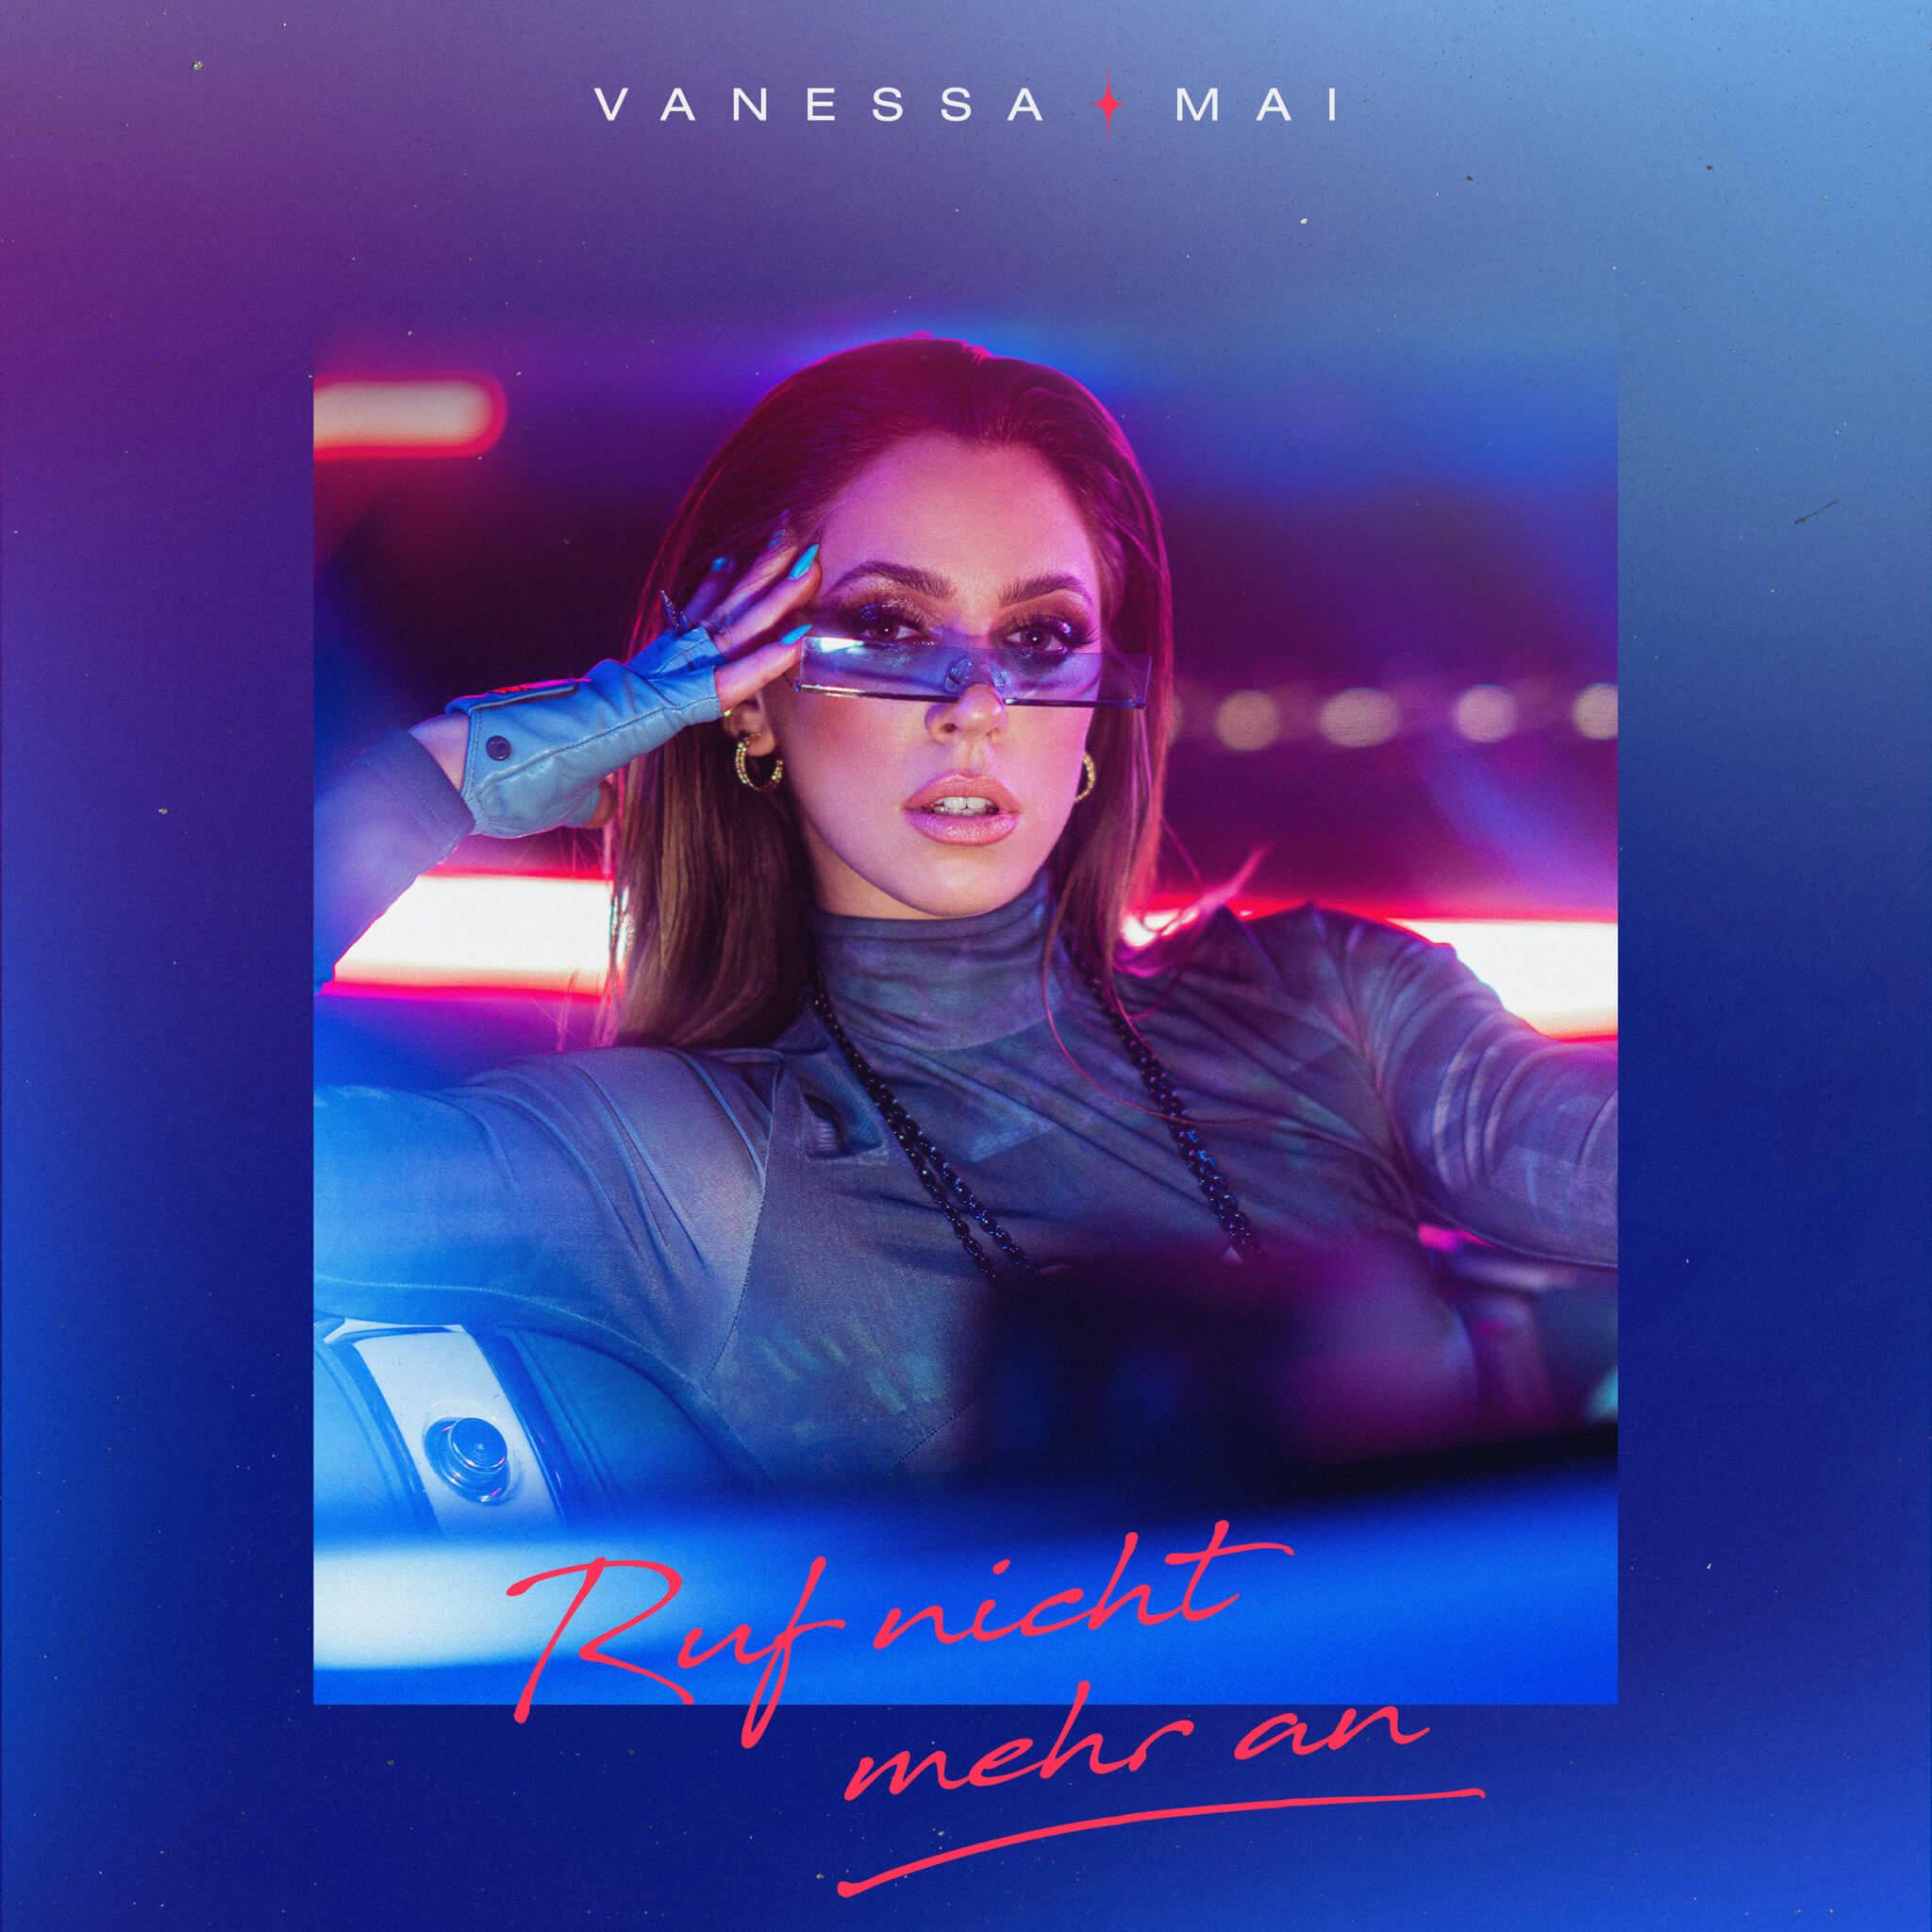 Vanessa Mai - Ruf nicht mehr an (2021)